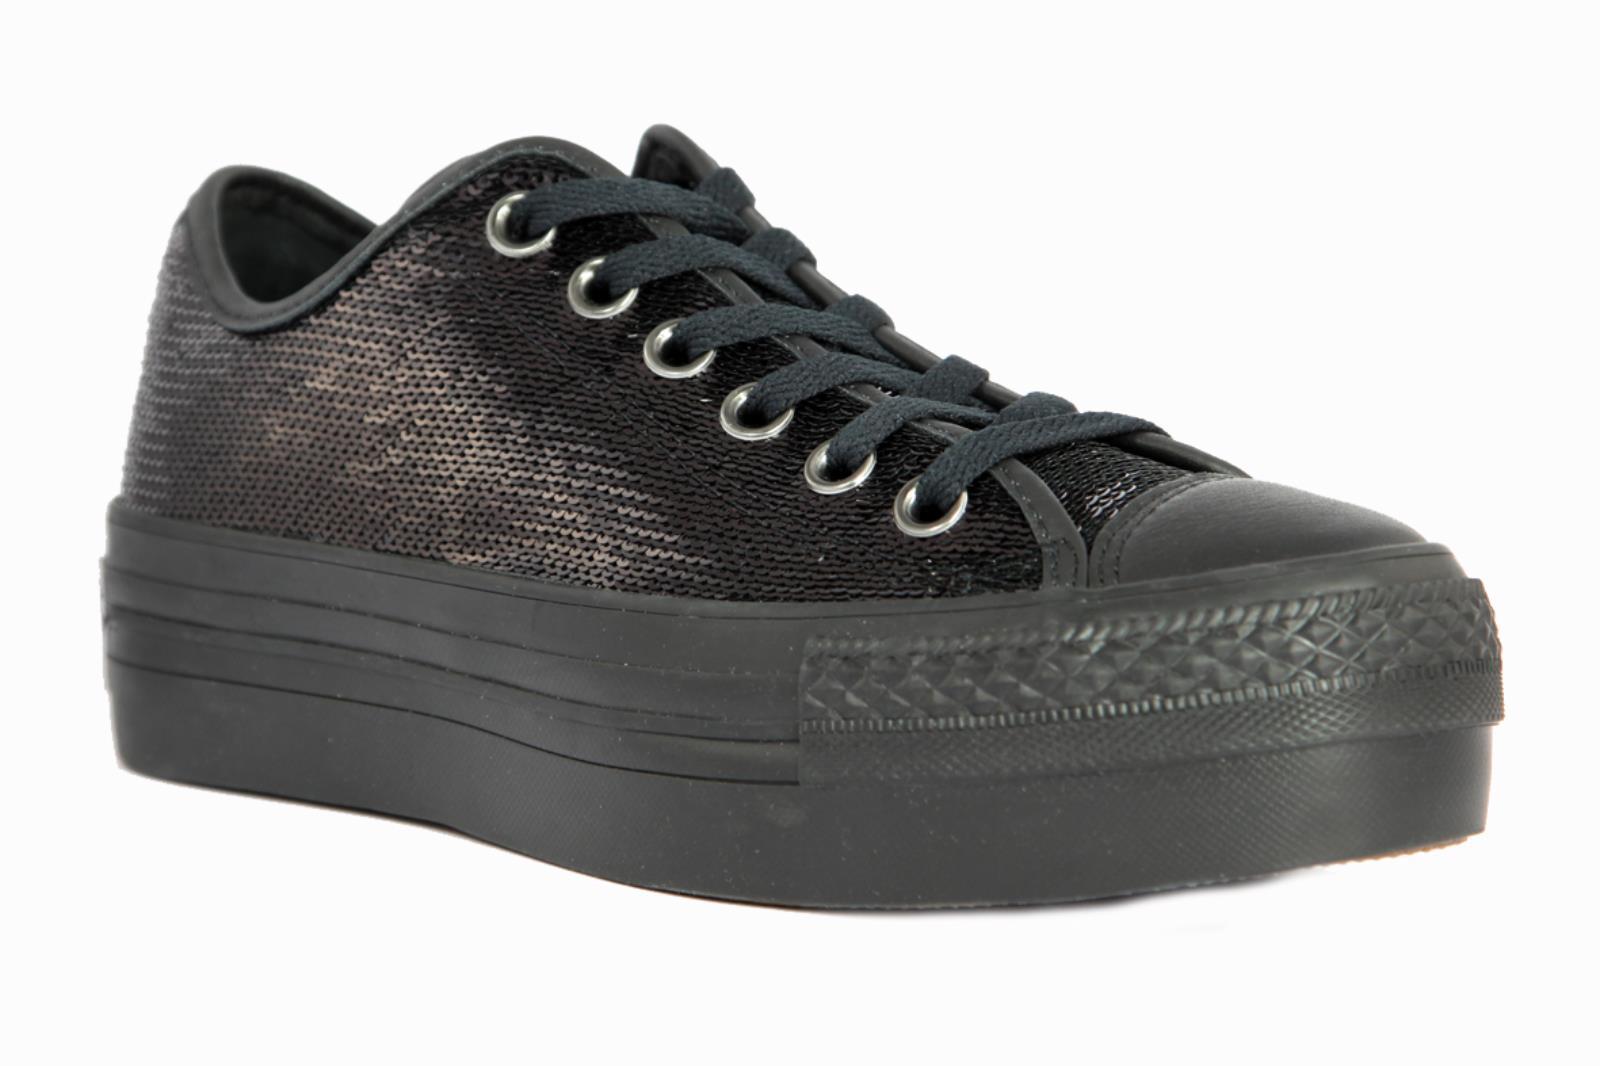 scarpe converse chuck taylor platform ox